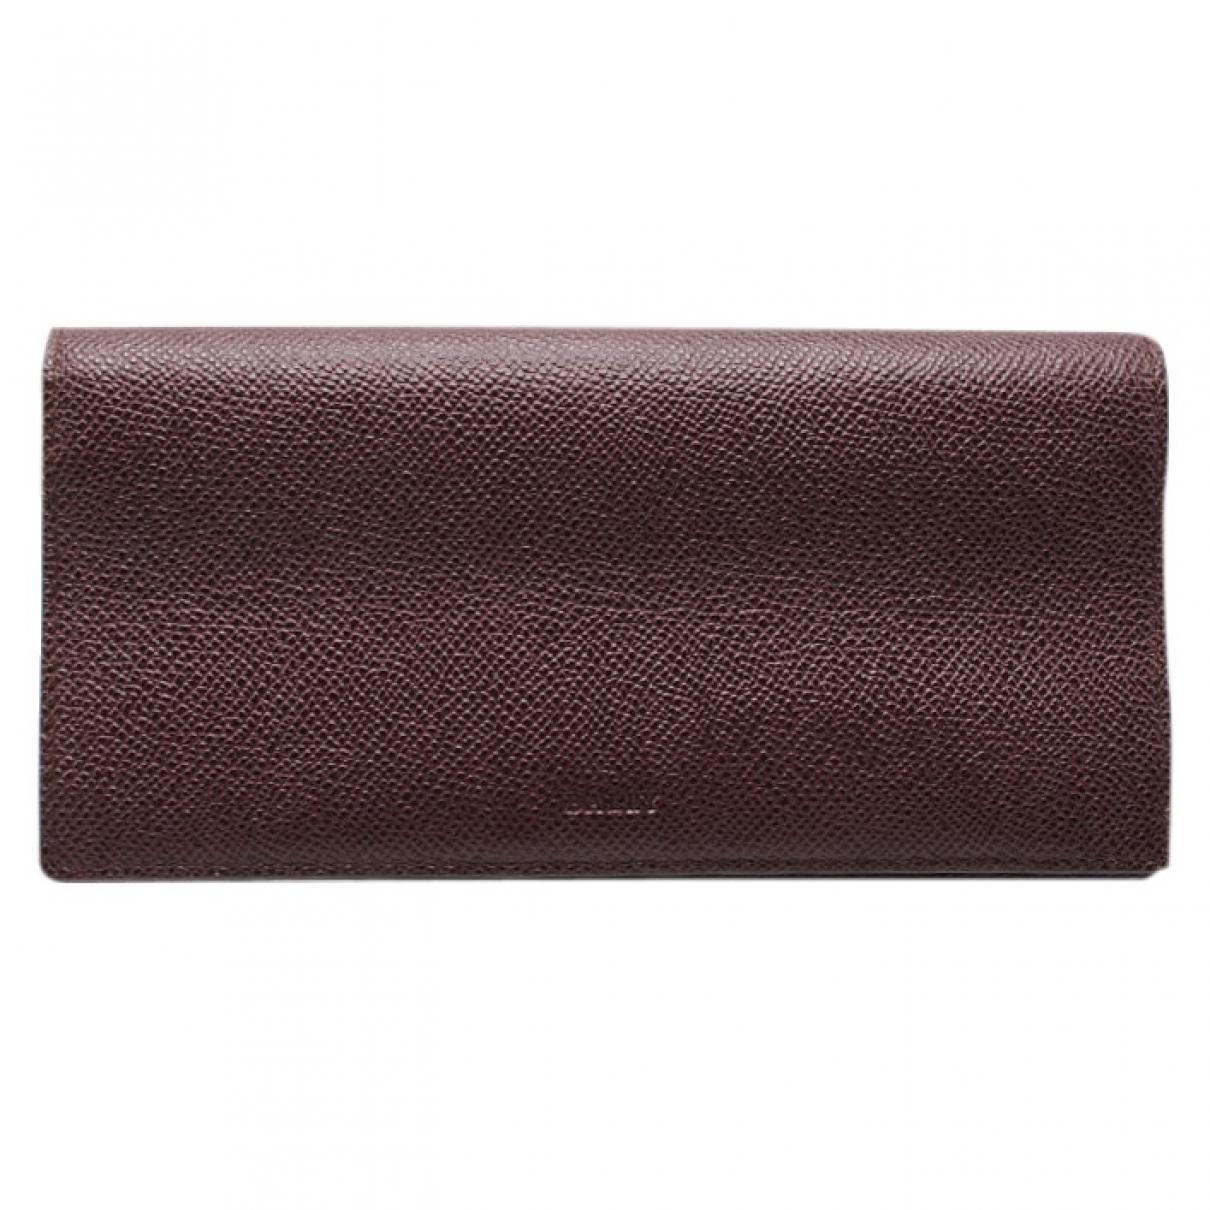 Bally \N Burgundy Leather wallet for Women \N